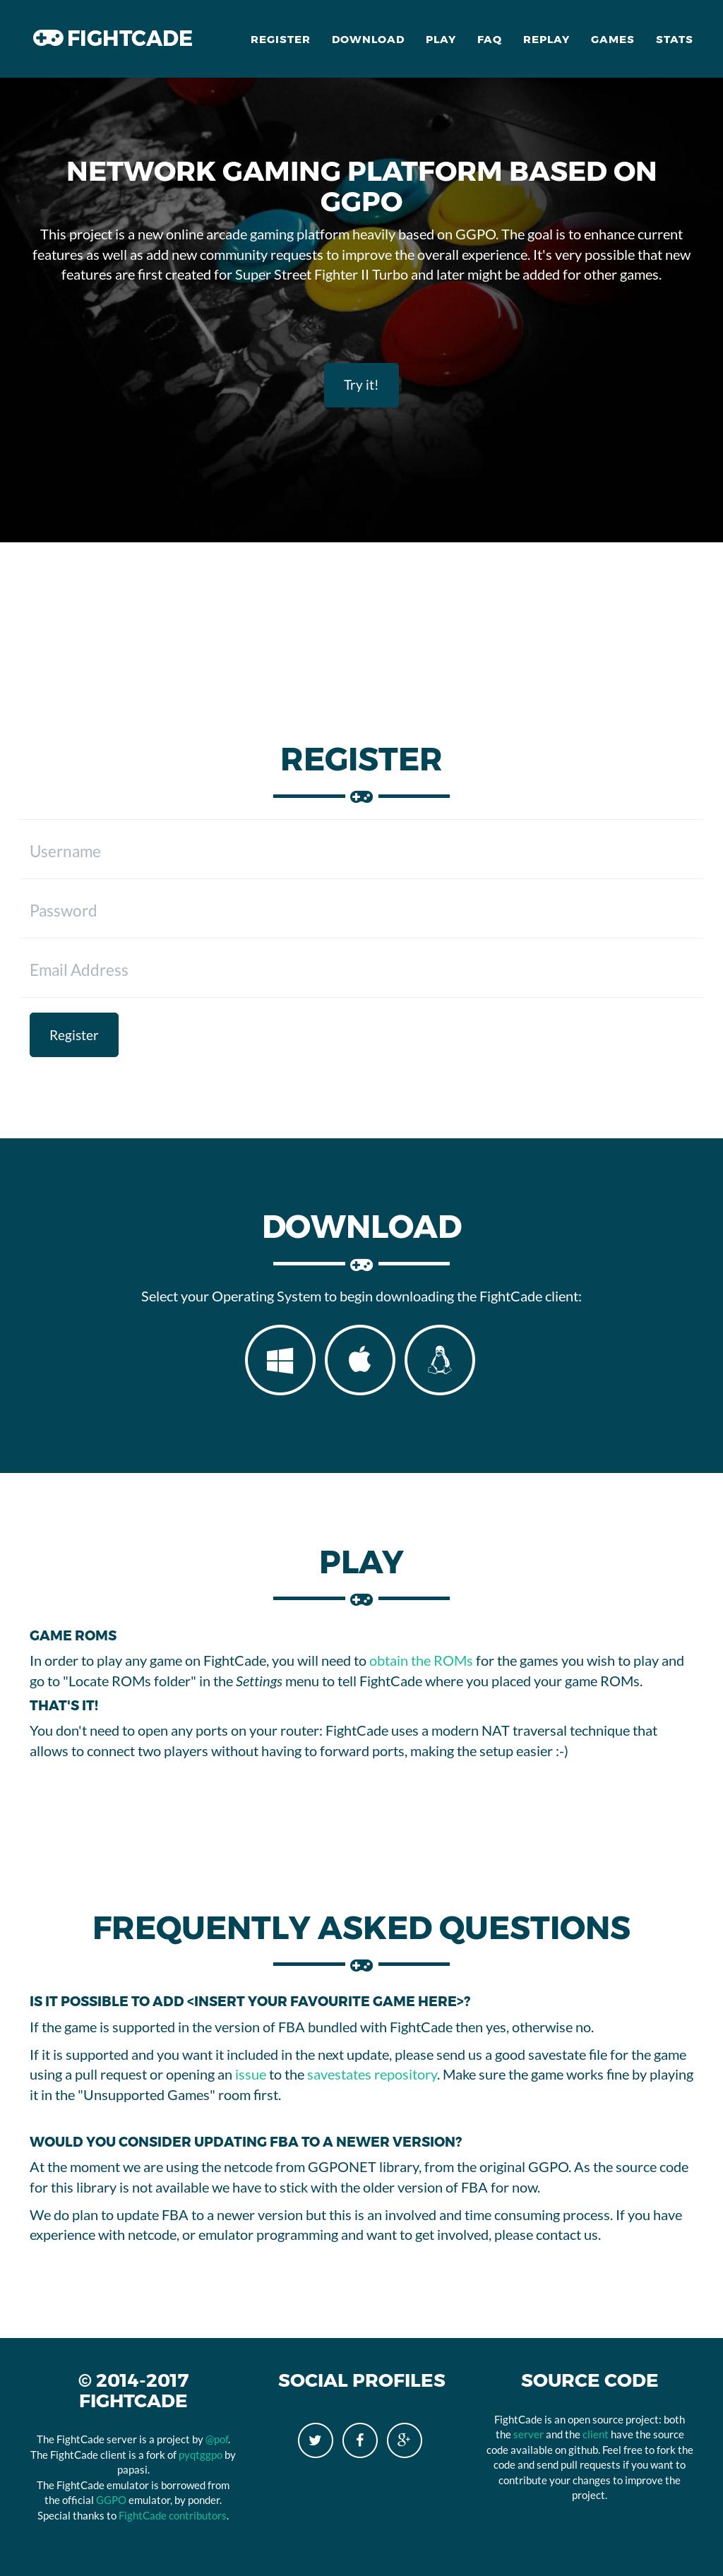 Ggpo roms download